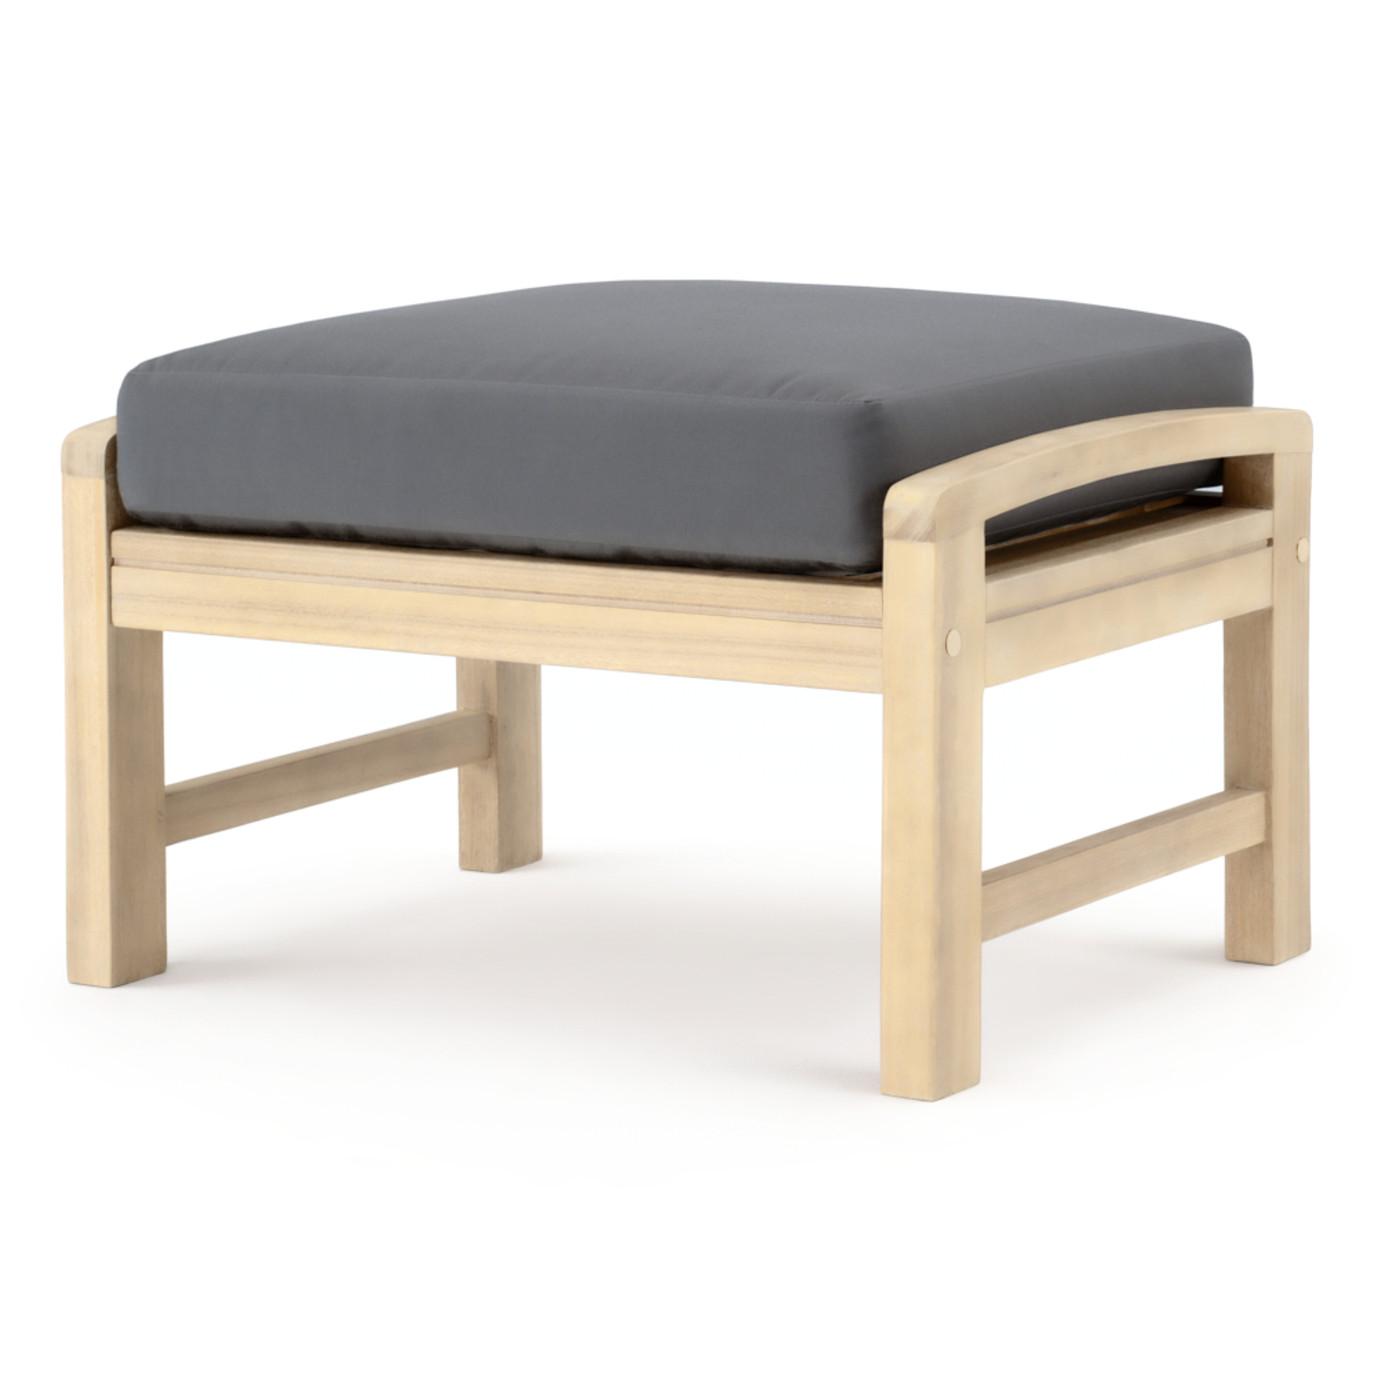 Kooper 8 Piece Sofa & Club Chair Set - Charcoal Gray